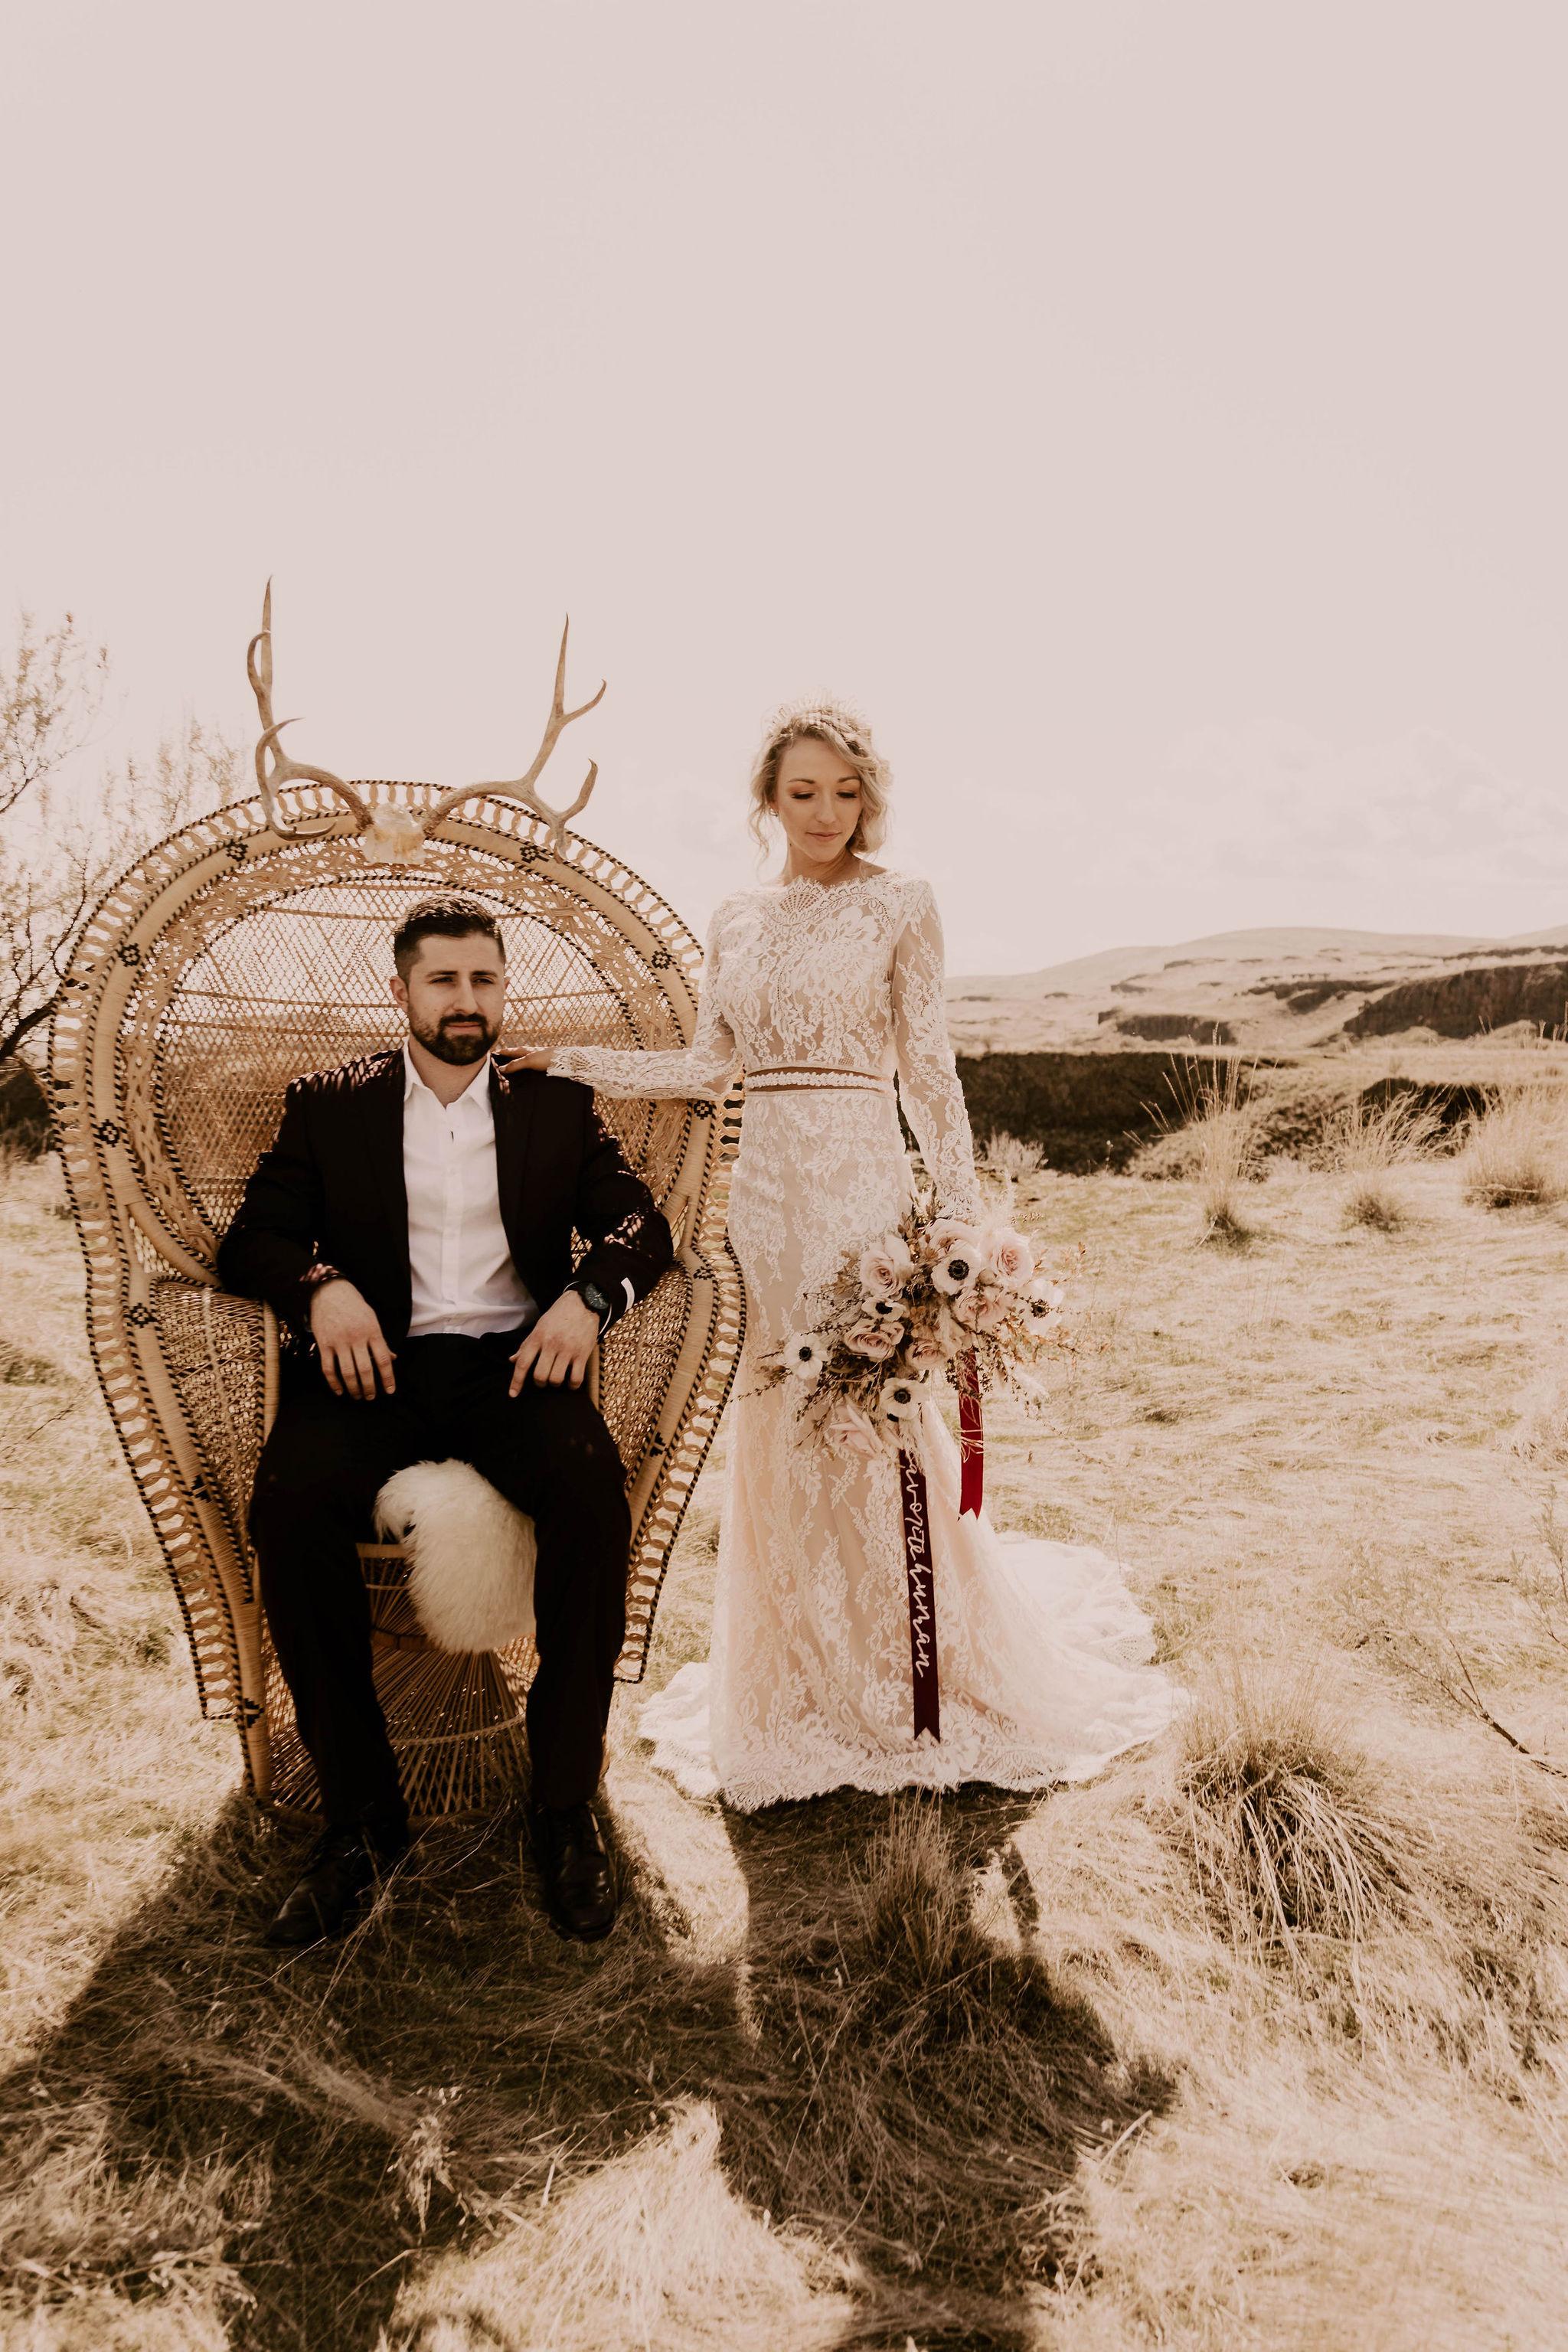 peacock chair spokane elopement bride